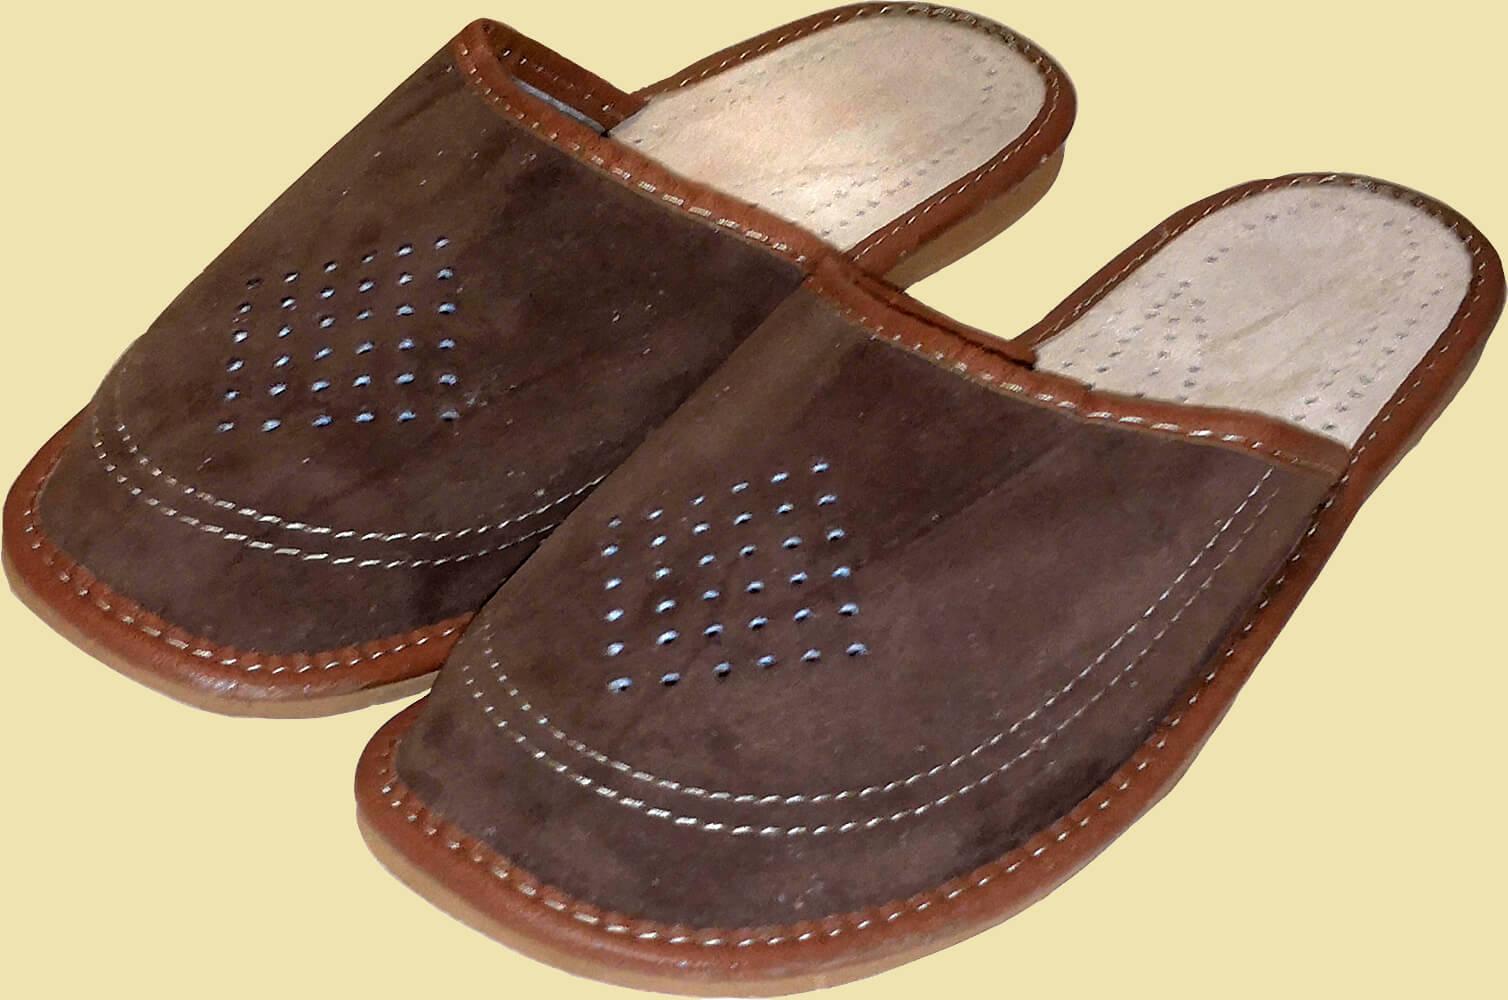 Кожаные тапки мужские Nowbut N507 44 размера. Фото 1